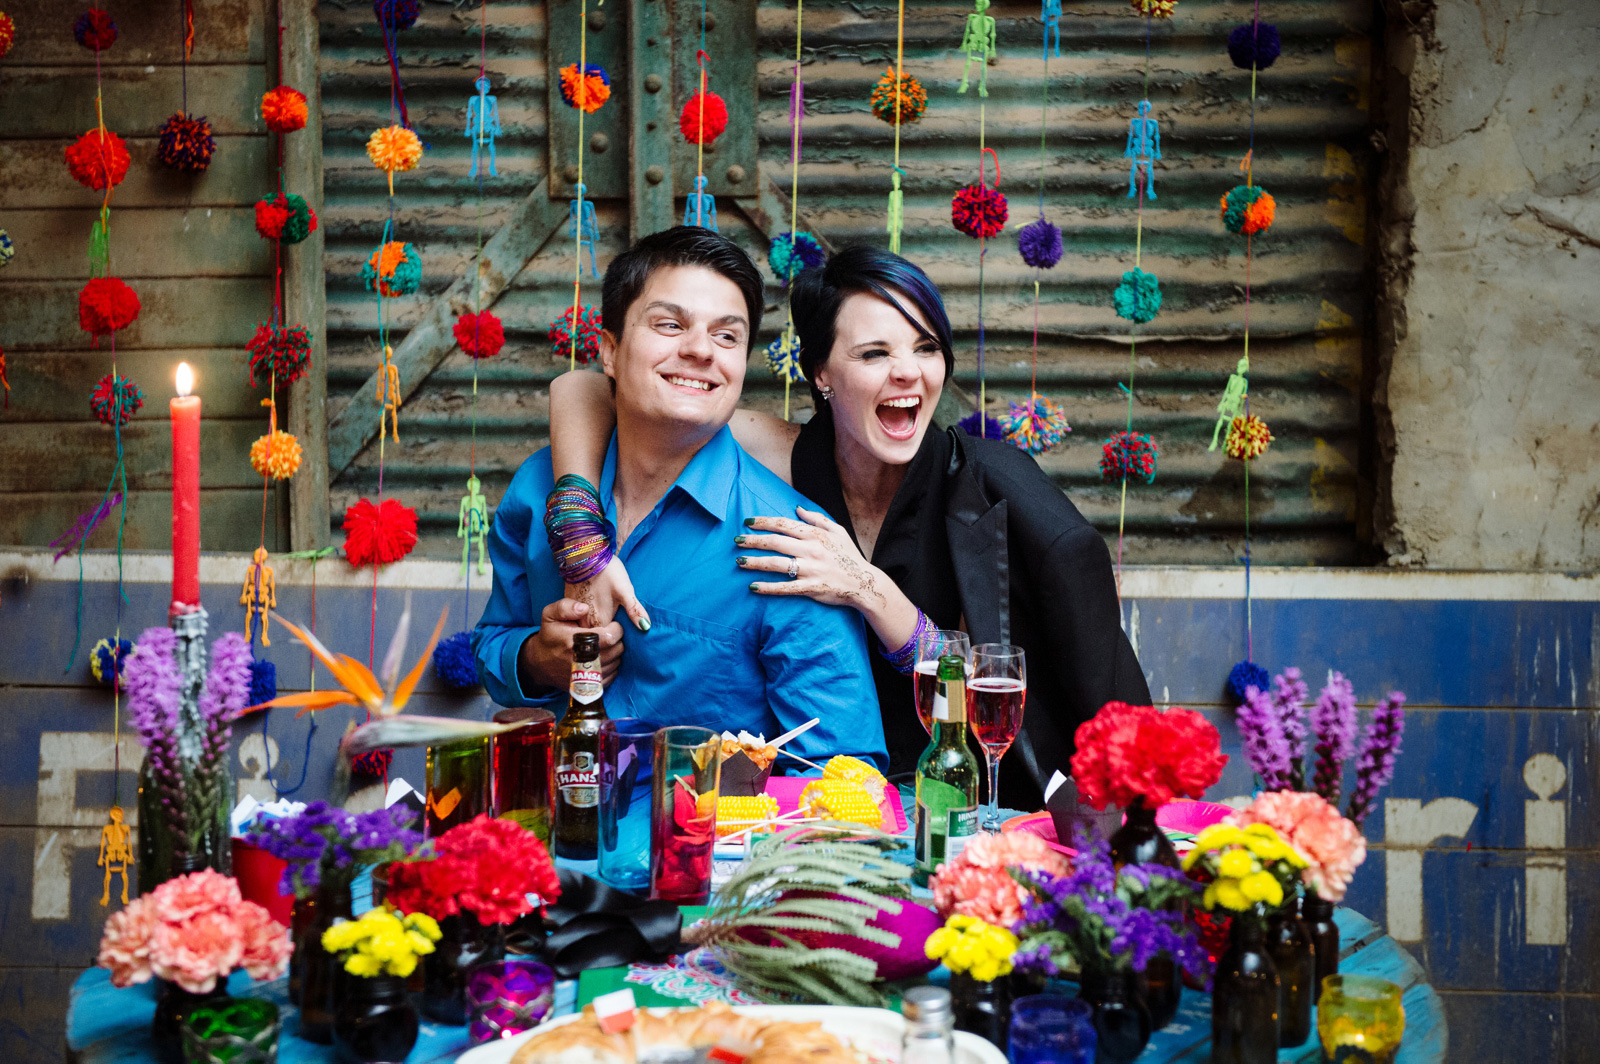 bride and groom at barn wedding